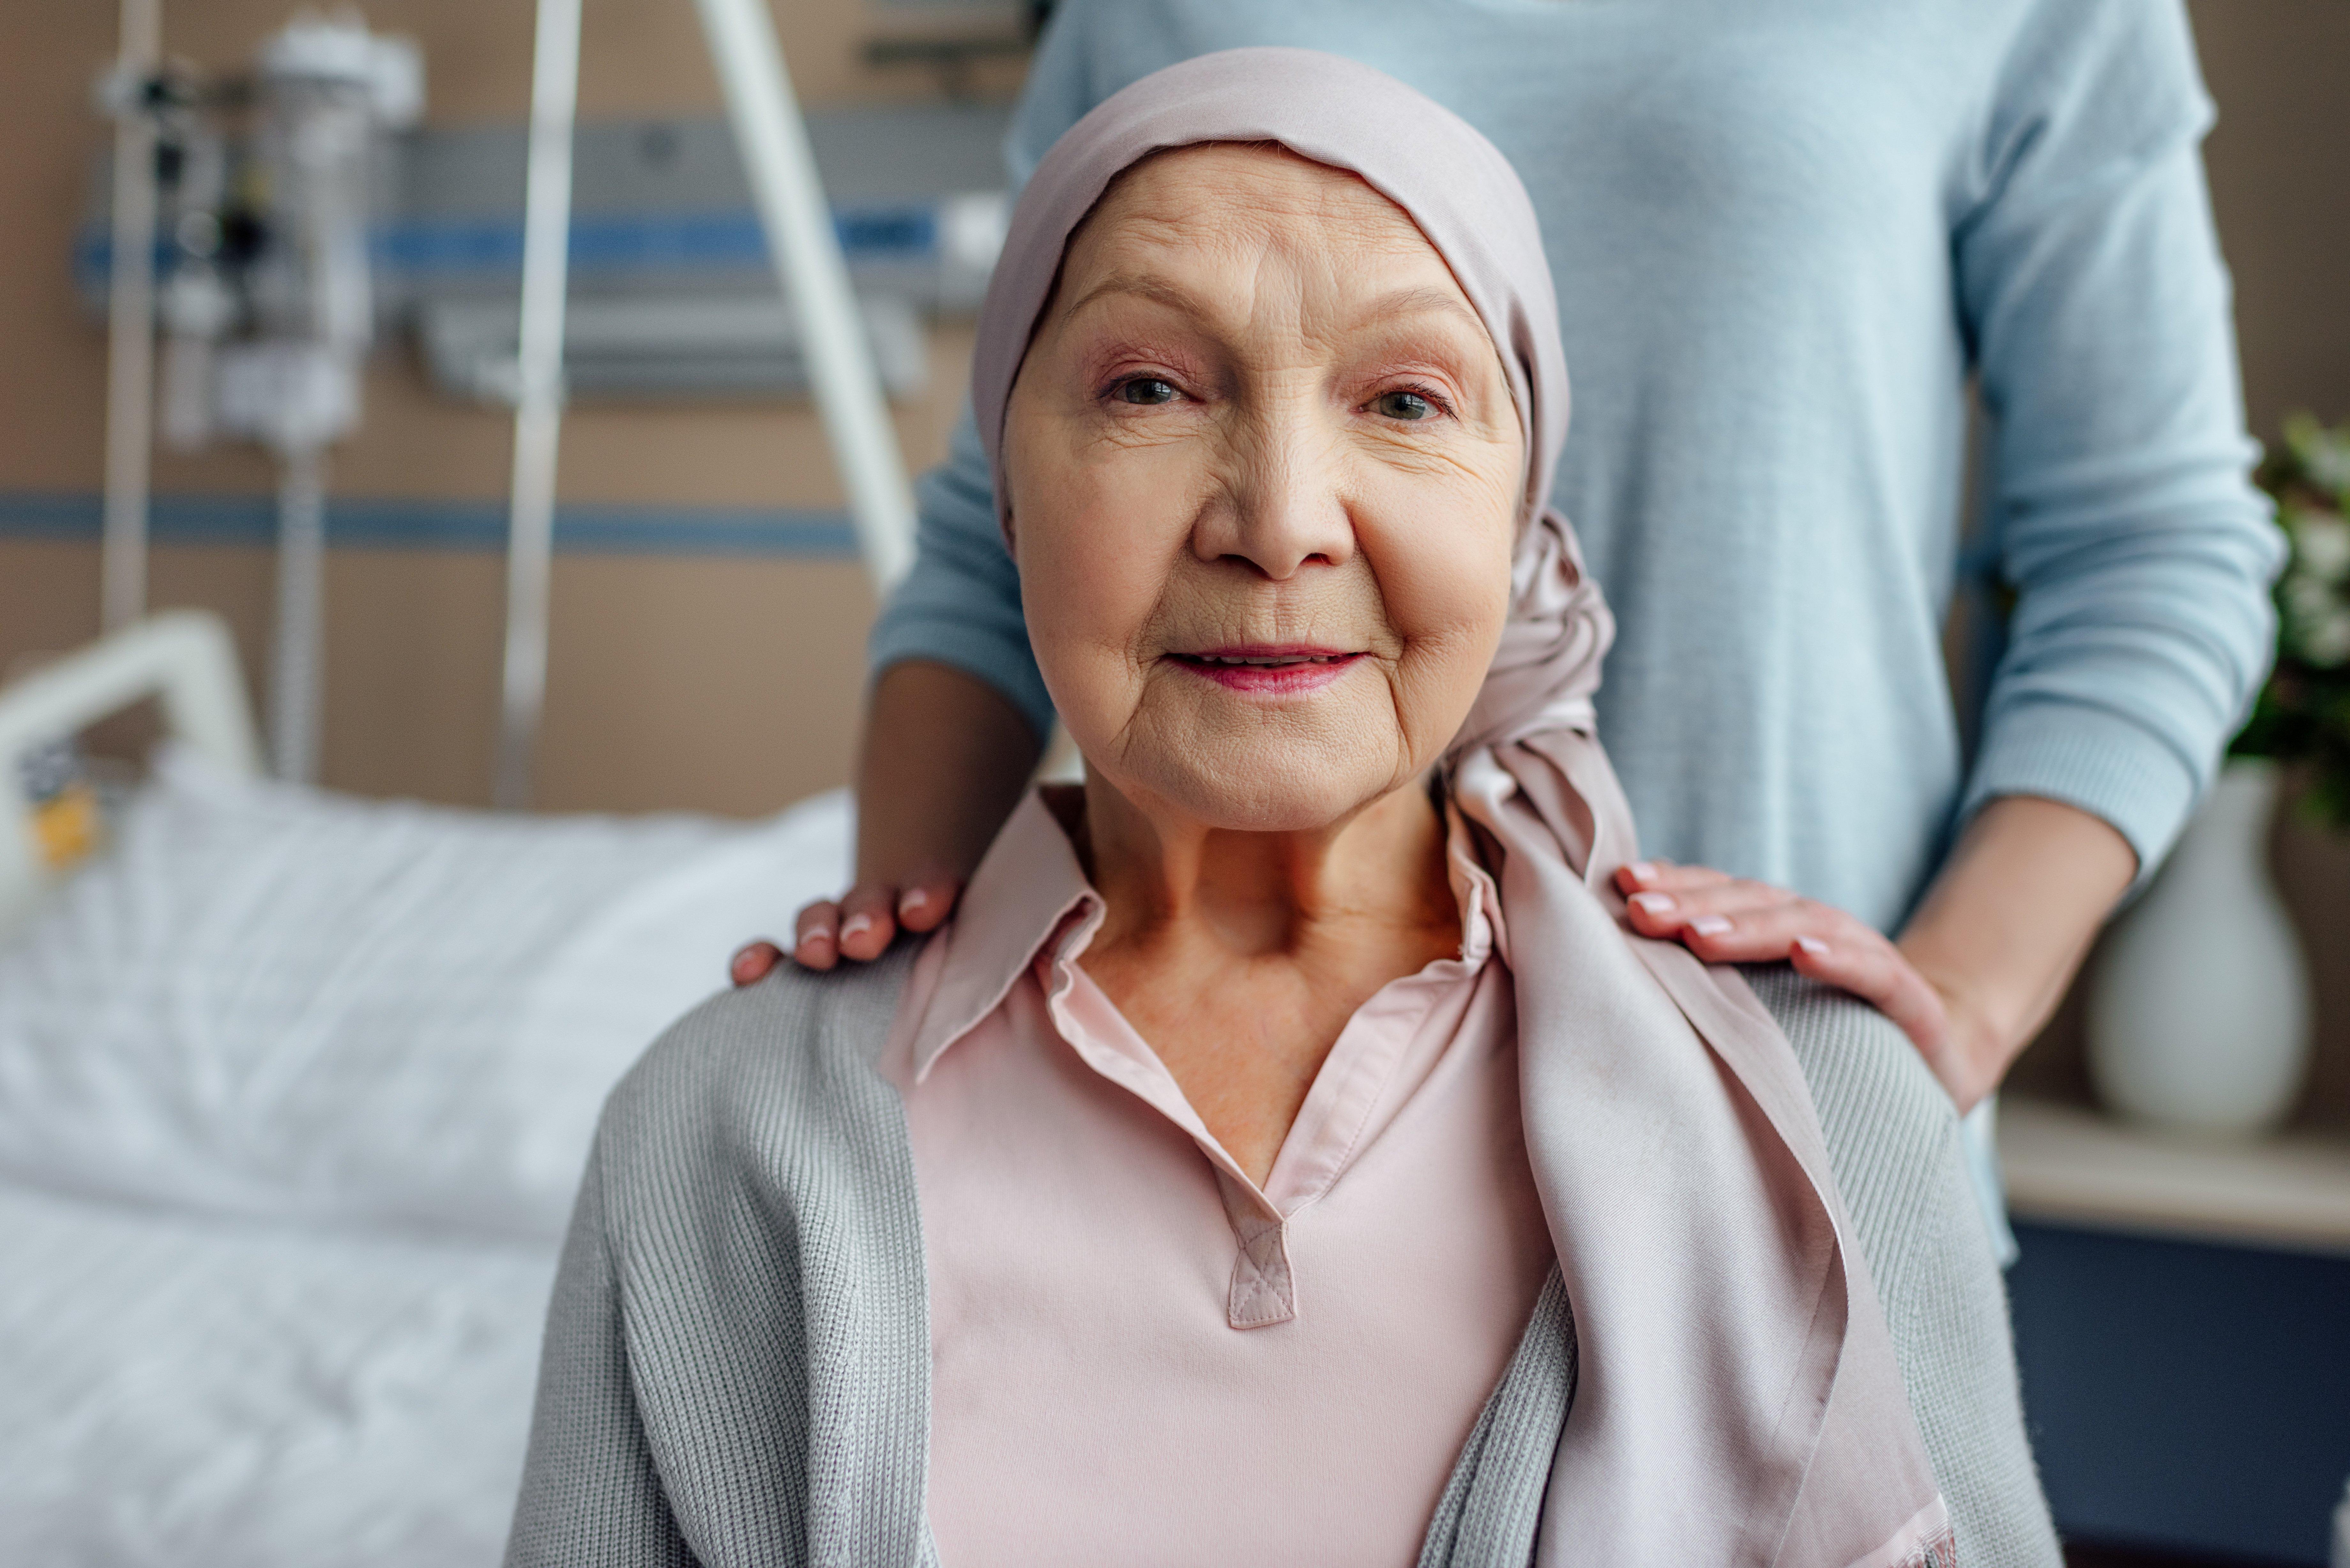 senior-woman-in-kerchief-in-hospital